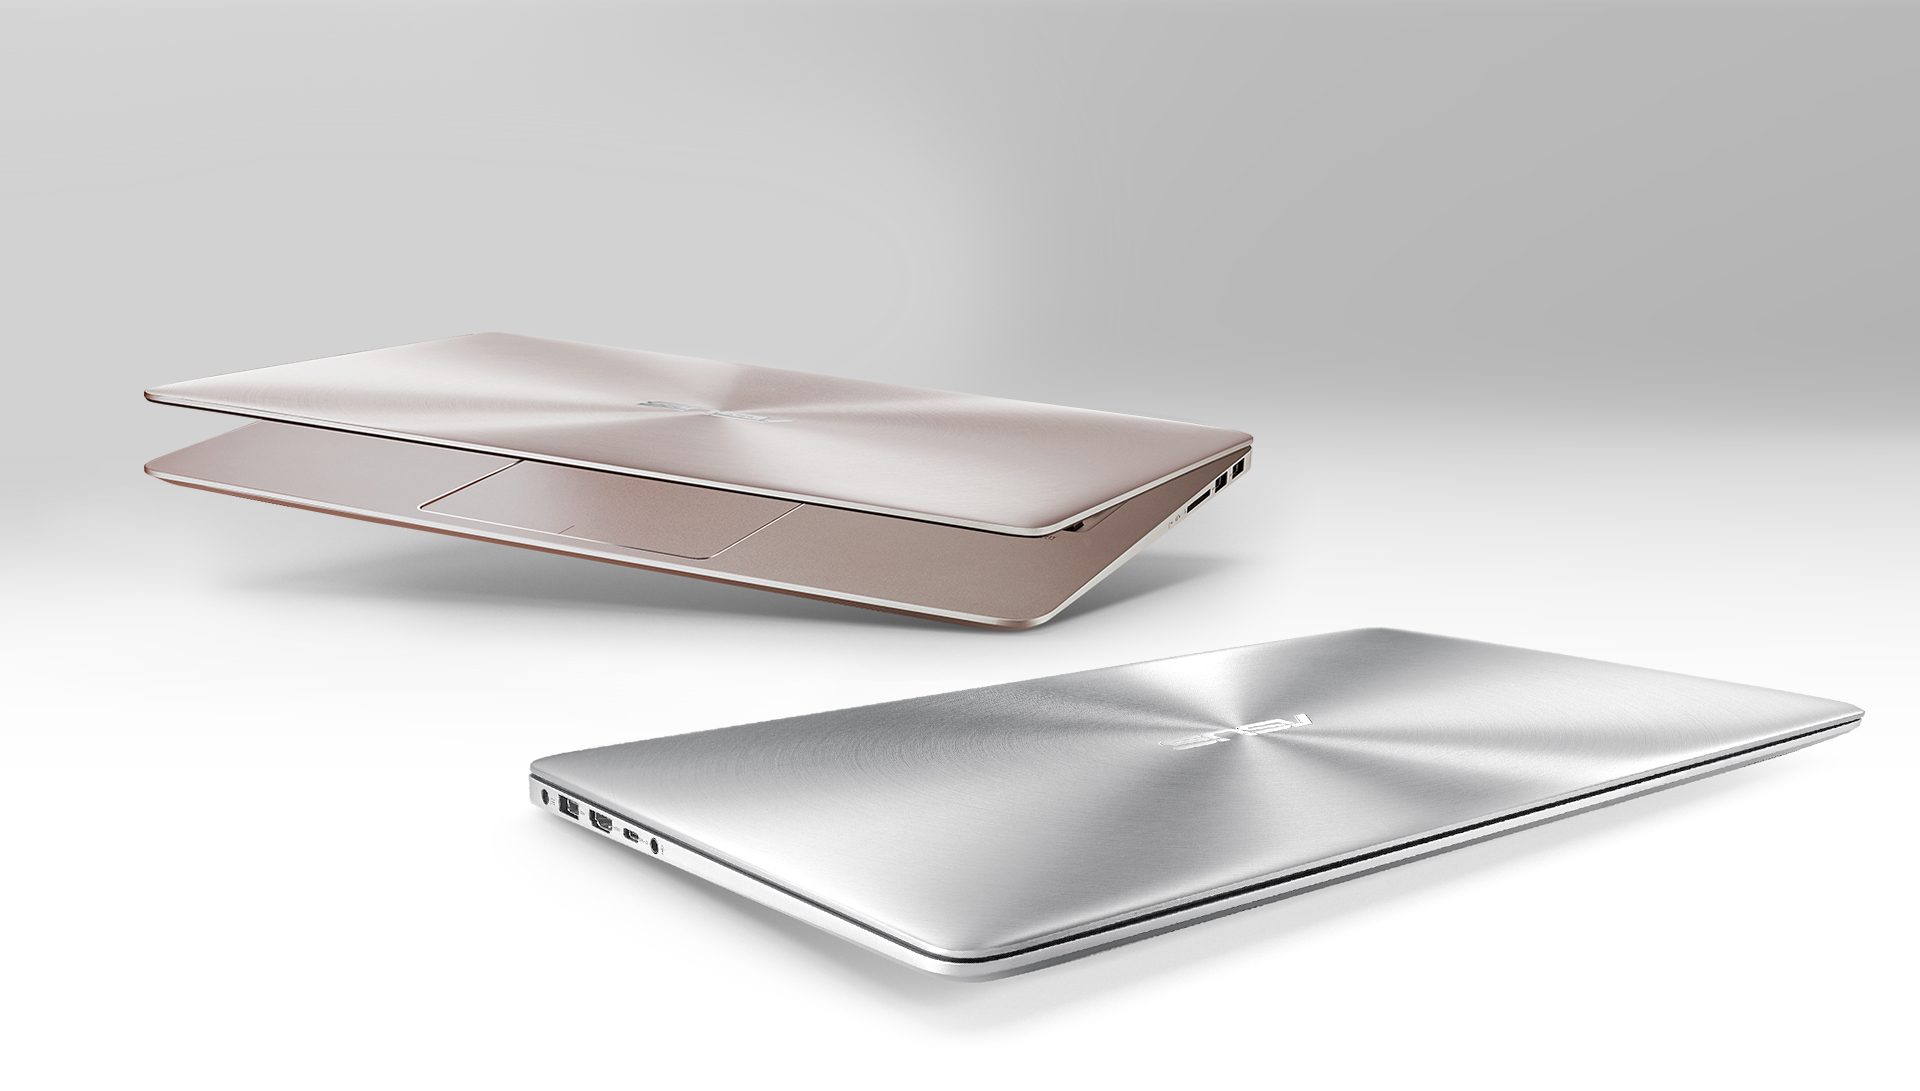 https://www.asus.com/Commercial-Laptops/ASUS-Zenbook-UX310UQ/websites/global/products/OCUElC1MyHDA1nQE/images/main/kv-main.jpg